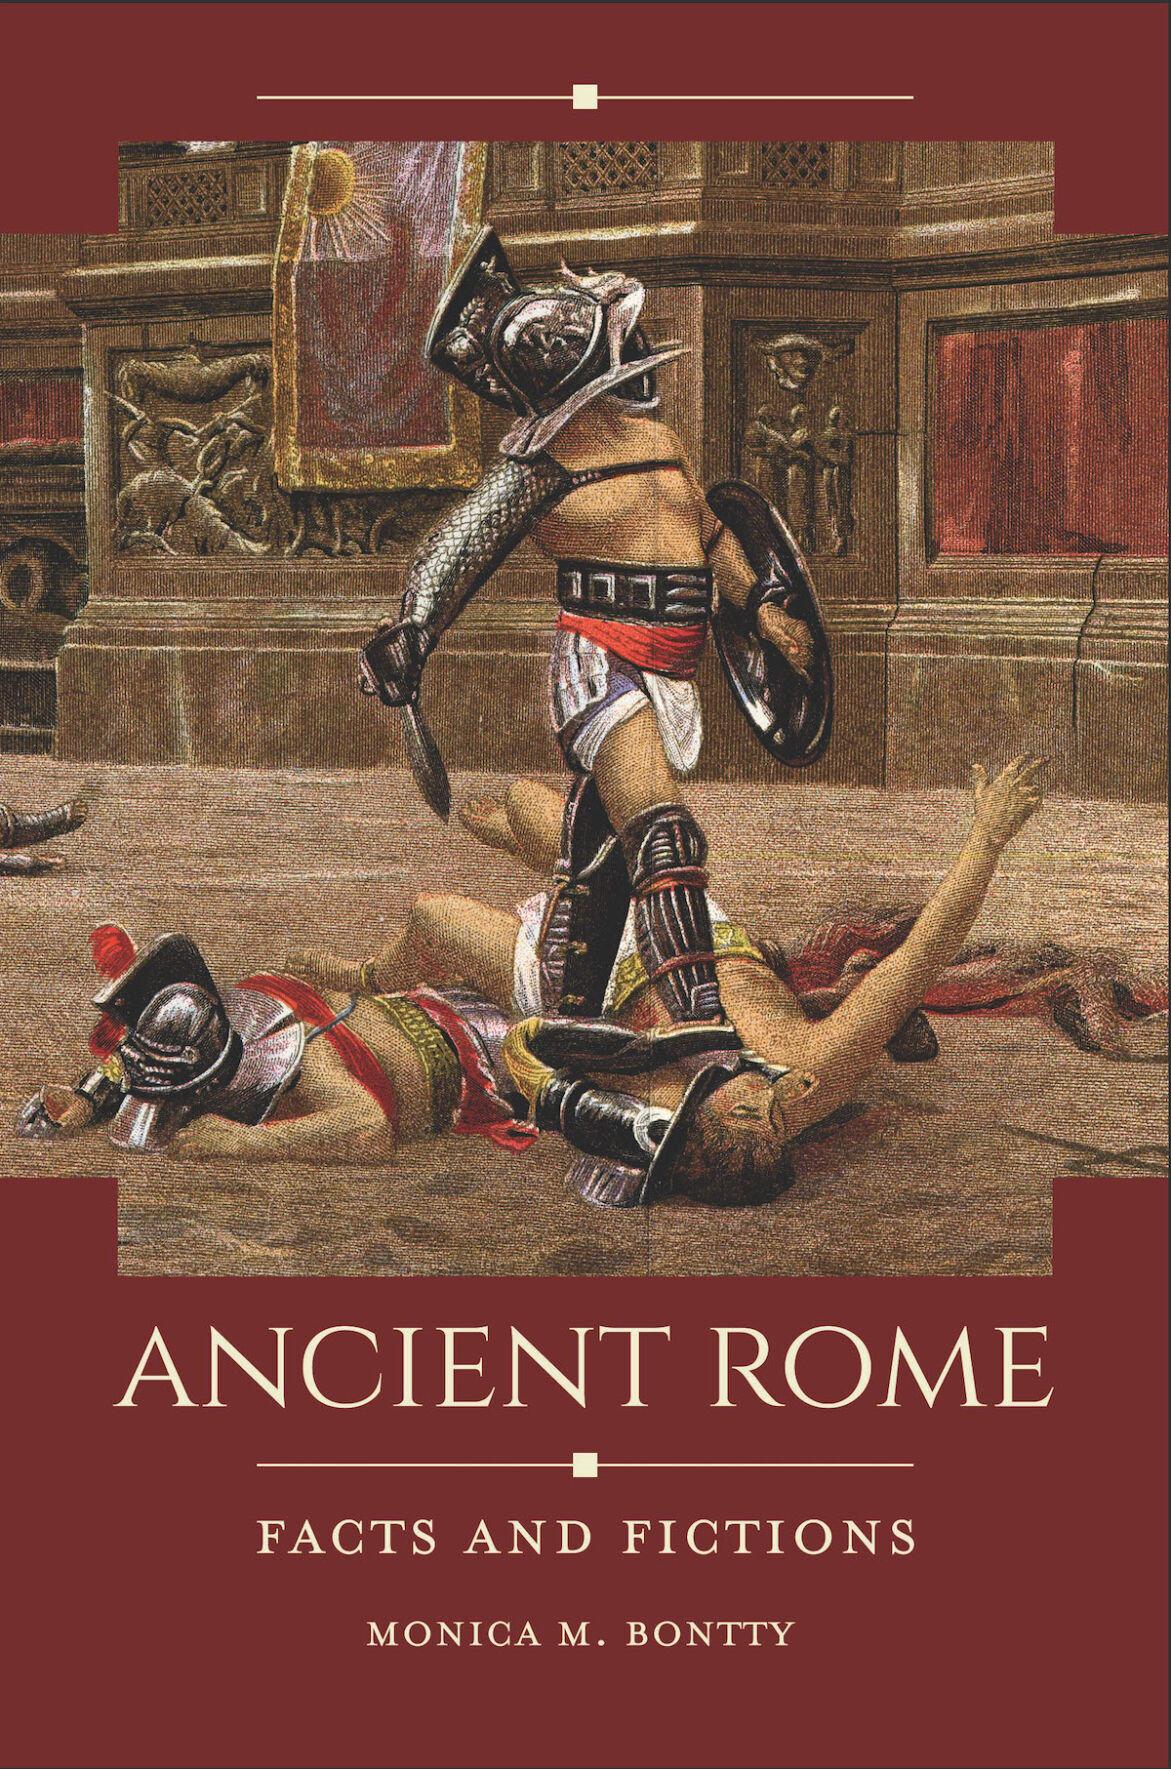 ULM_Bonnty_Ancient Rome book cover.jpg